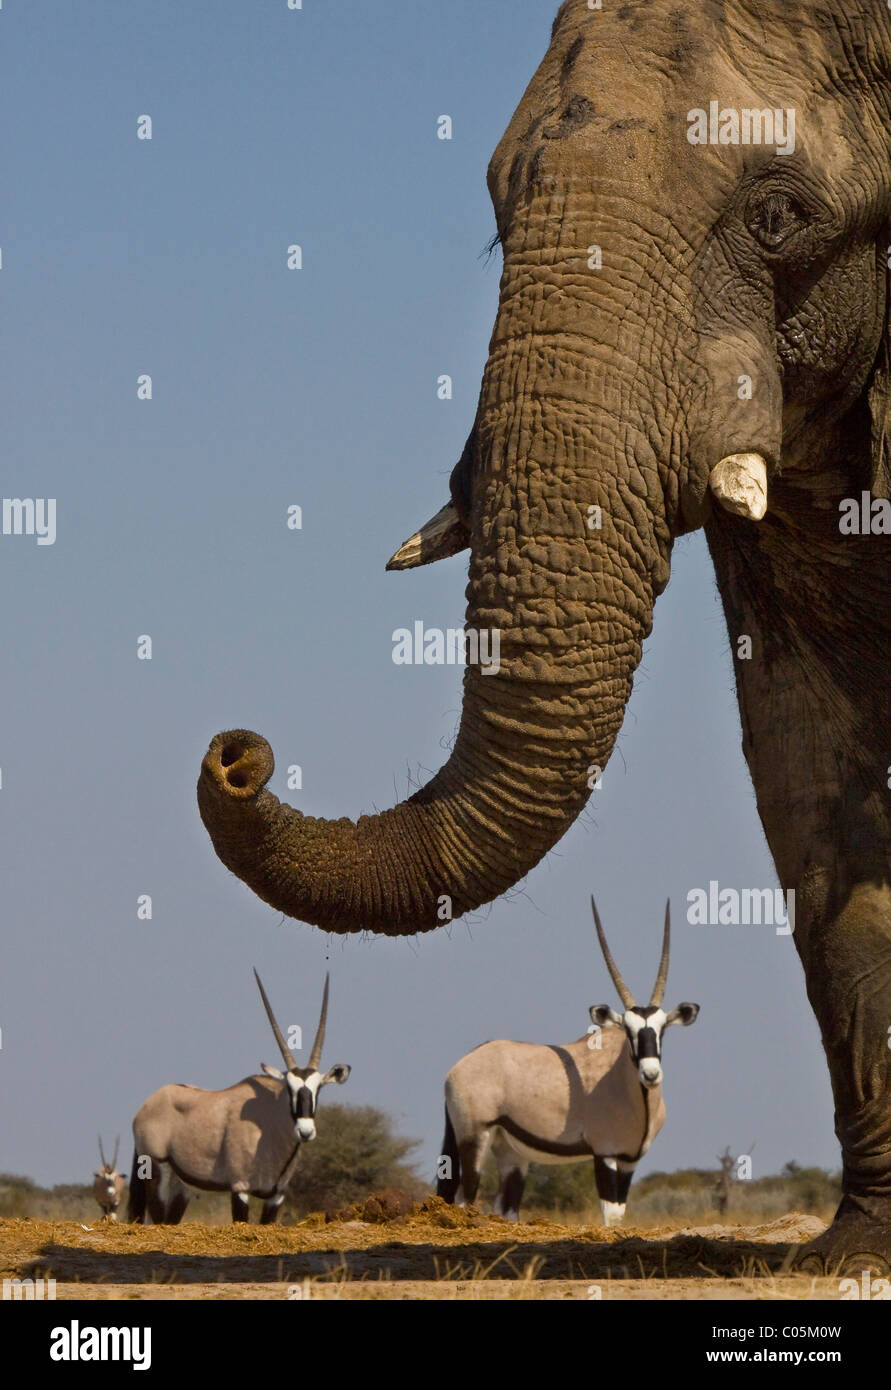 Elefant und Gemsbok, Etosha Nationalpark, Namibia. Stockbild